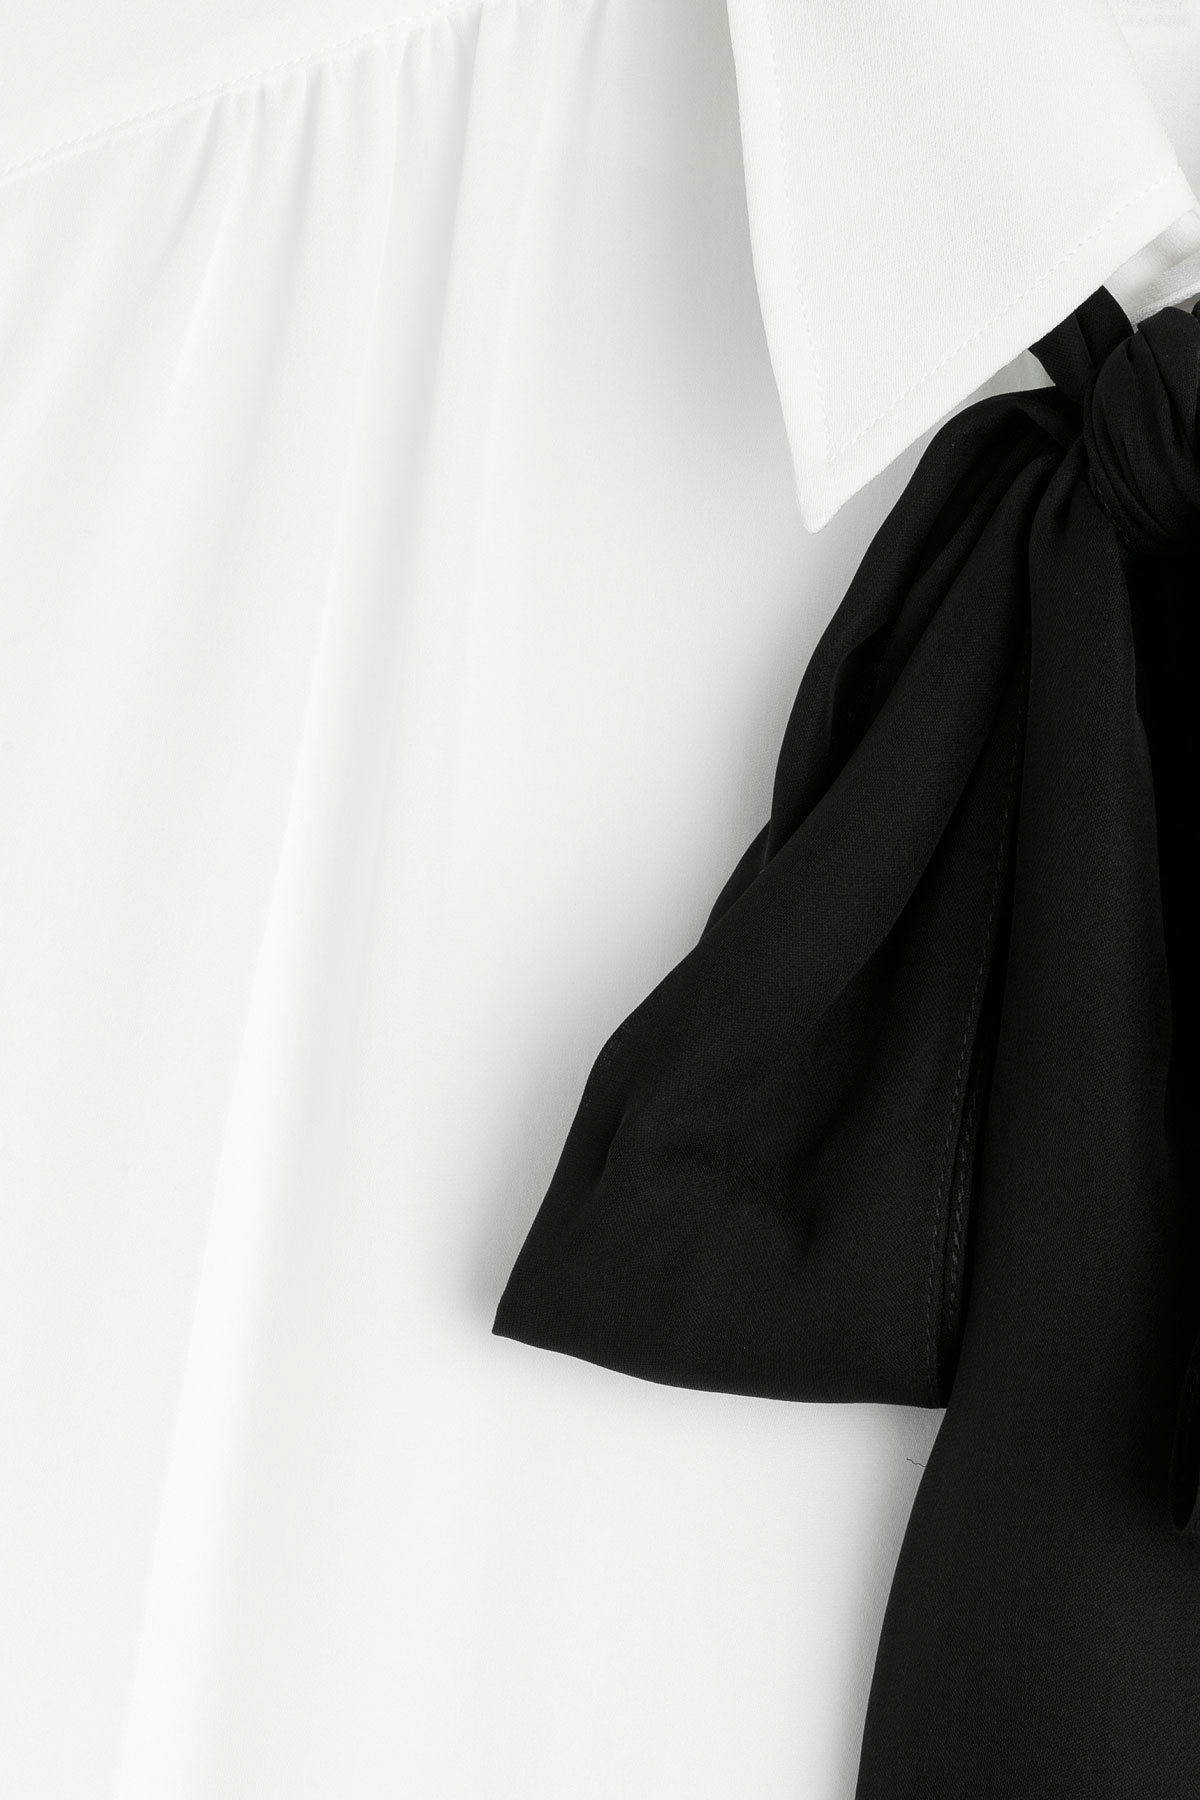 211d94ea5e5a29 Black Silk Blouse With Bow - Foto Blouse and Pocket Fensterdicht.Com